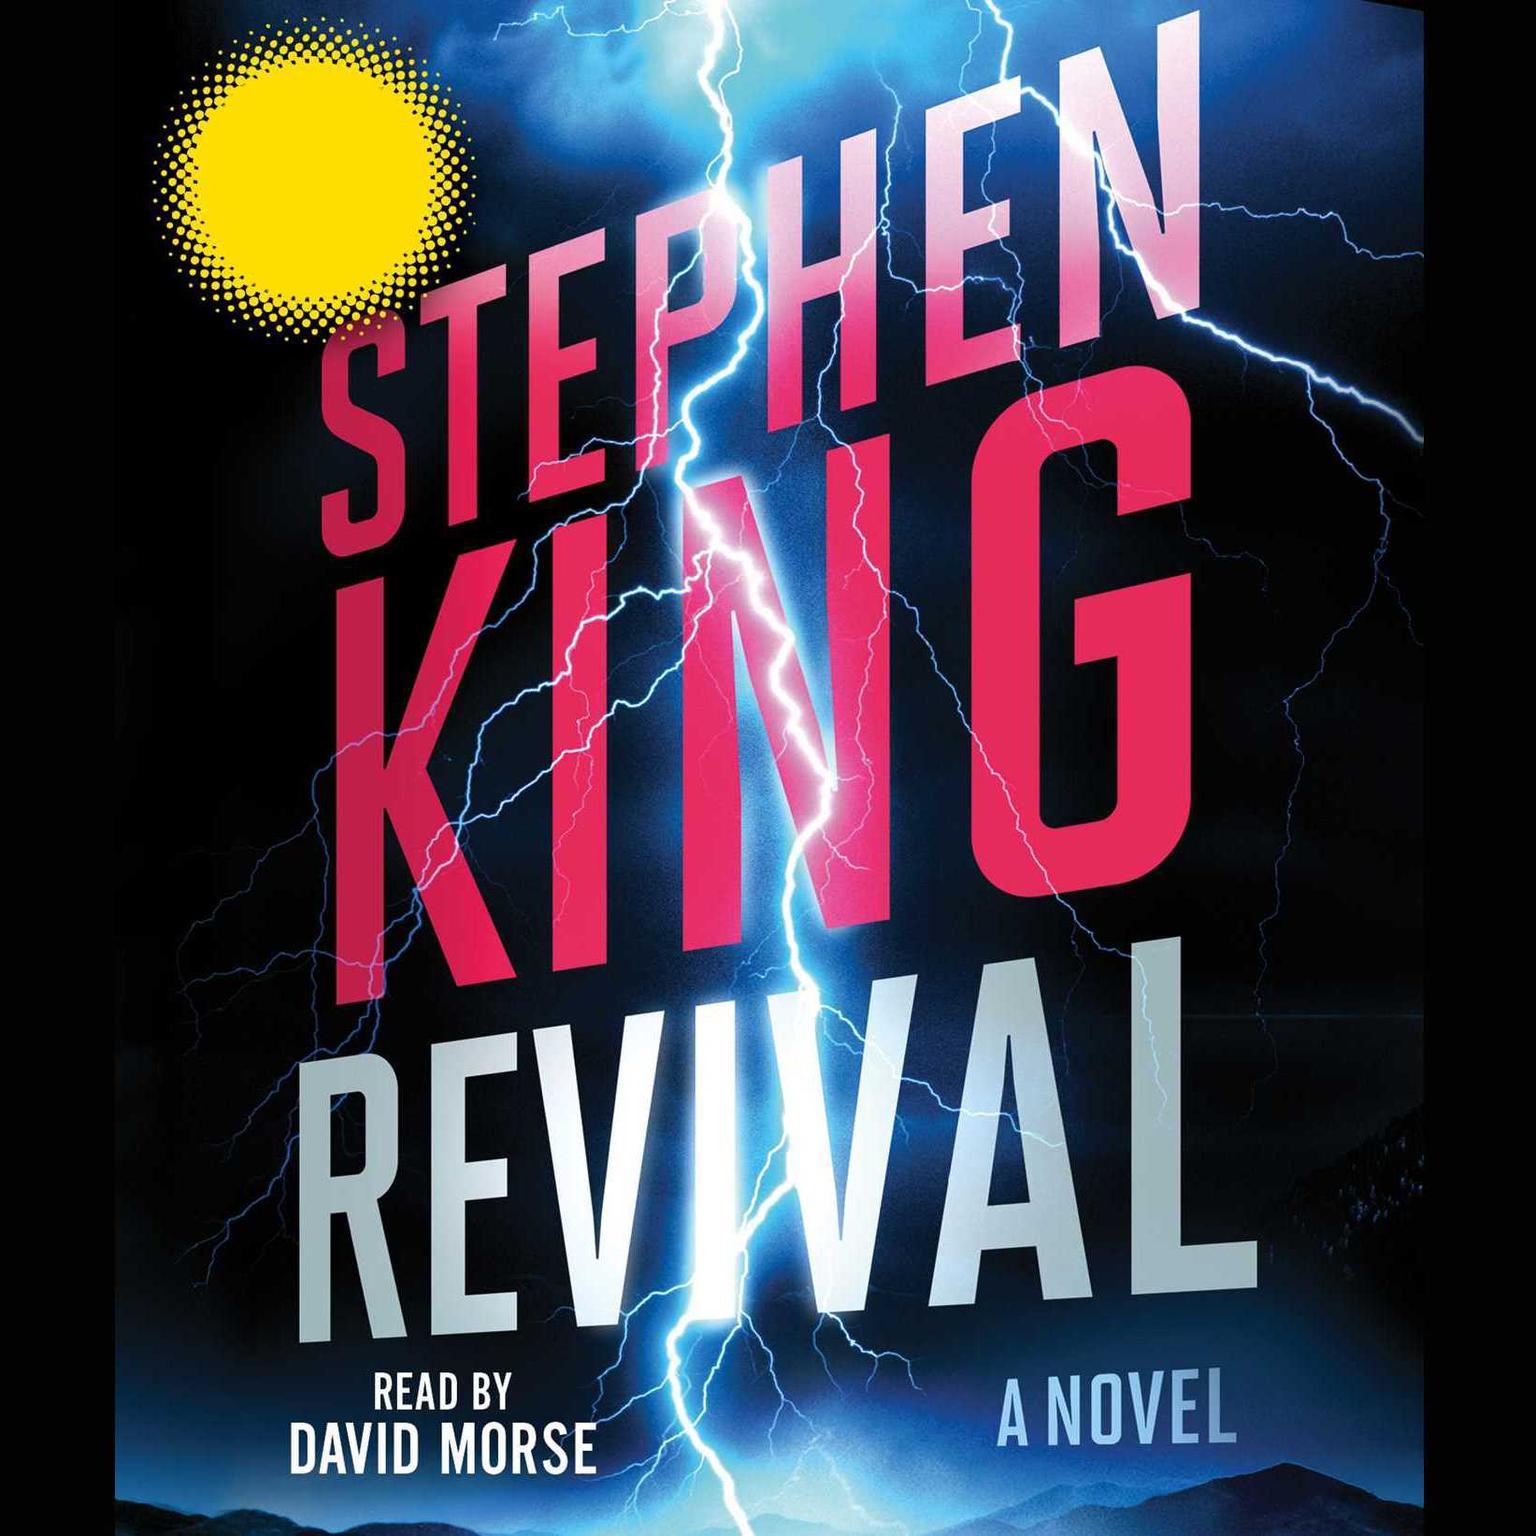 Printable Revival: A Novel Audiobook Cover Art